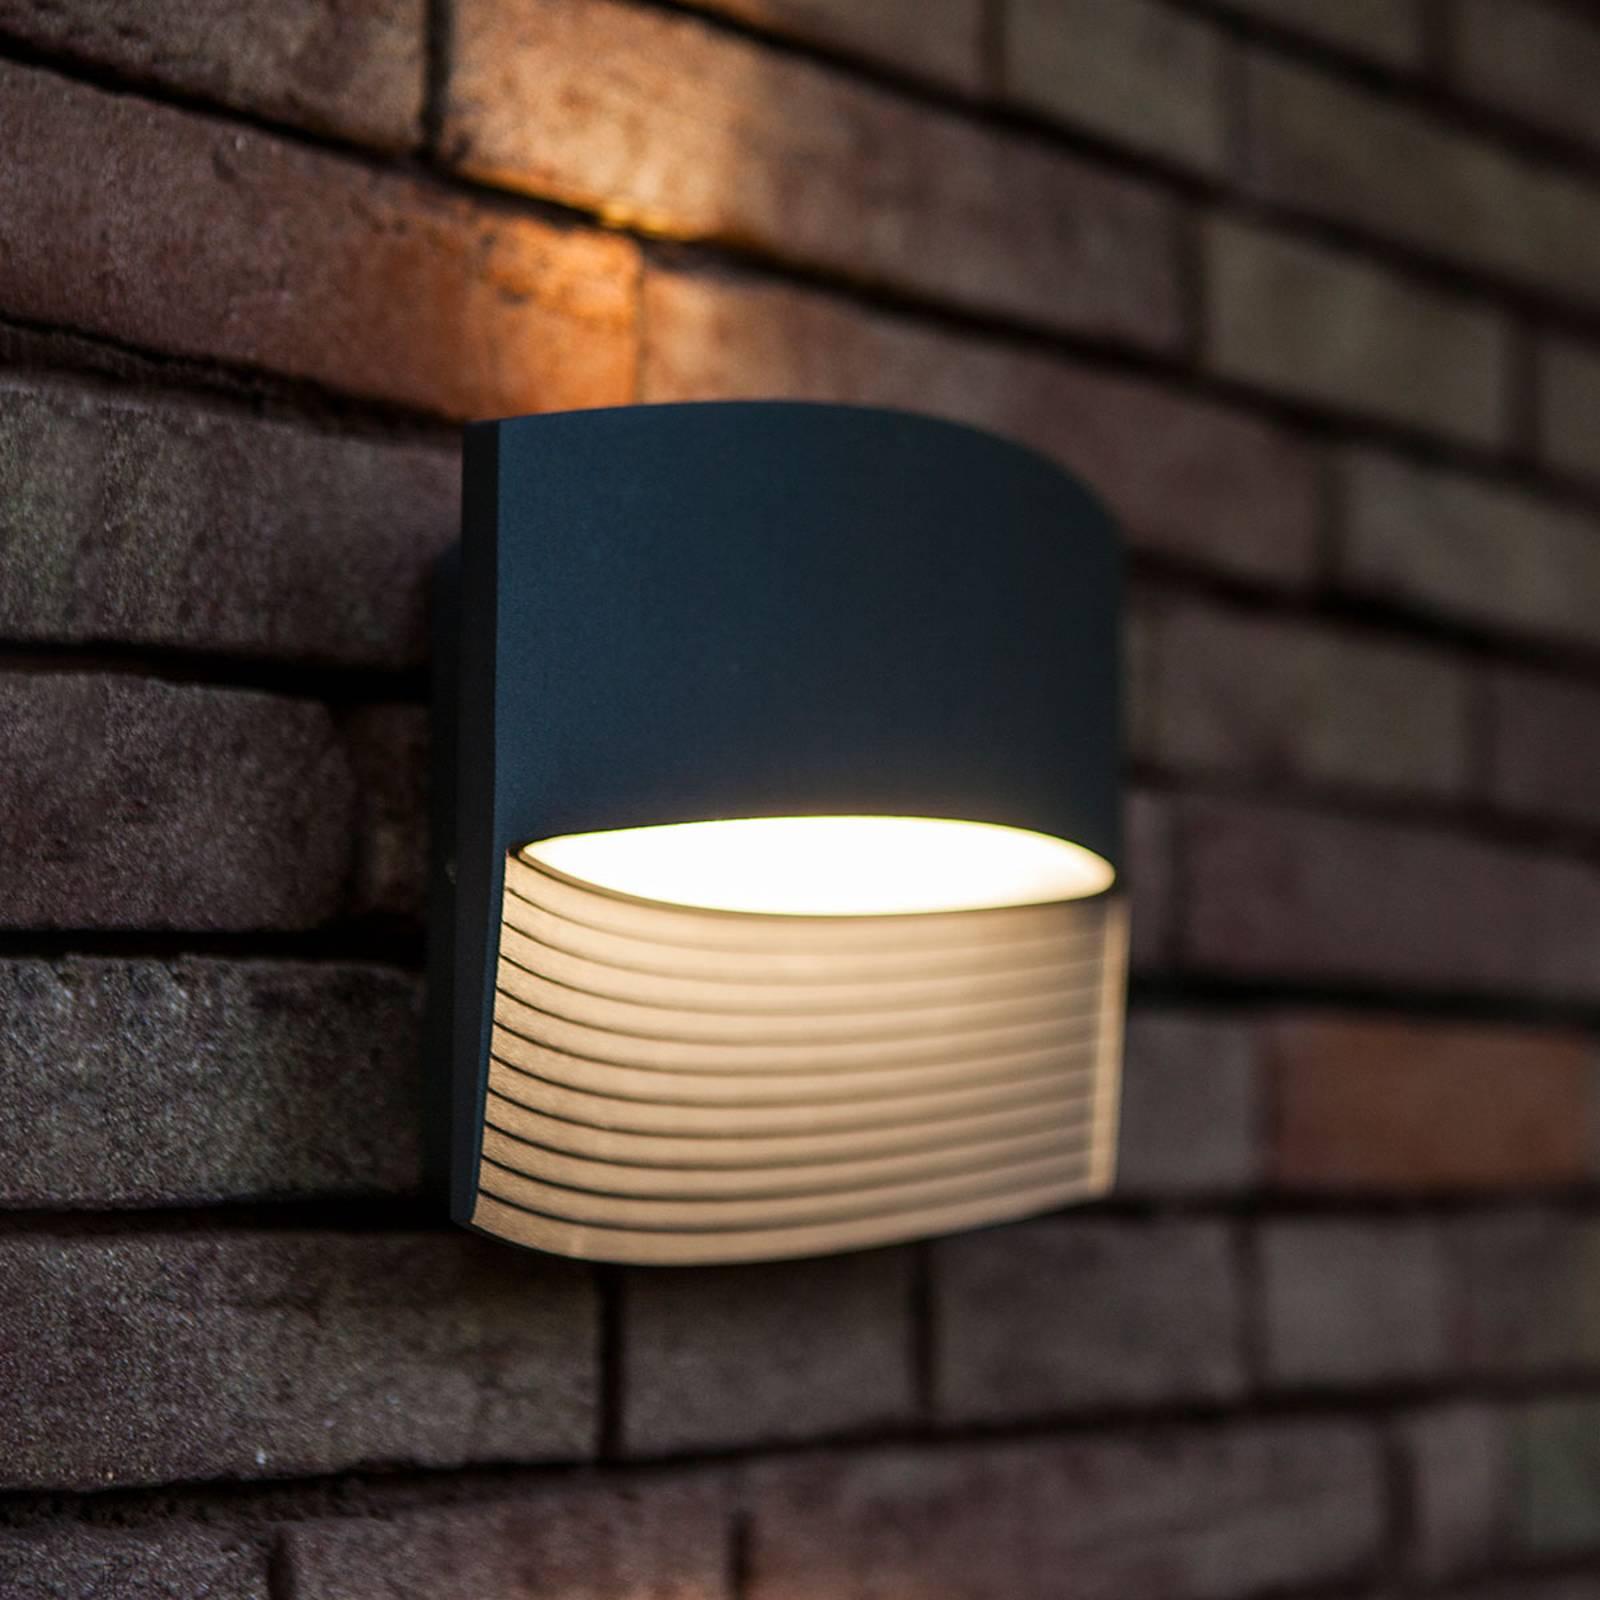 Anthrazitfarbene LED-Außenwandleuchte Lotus